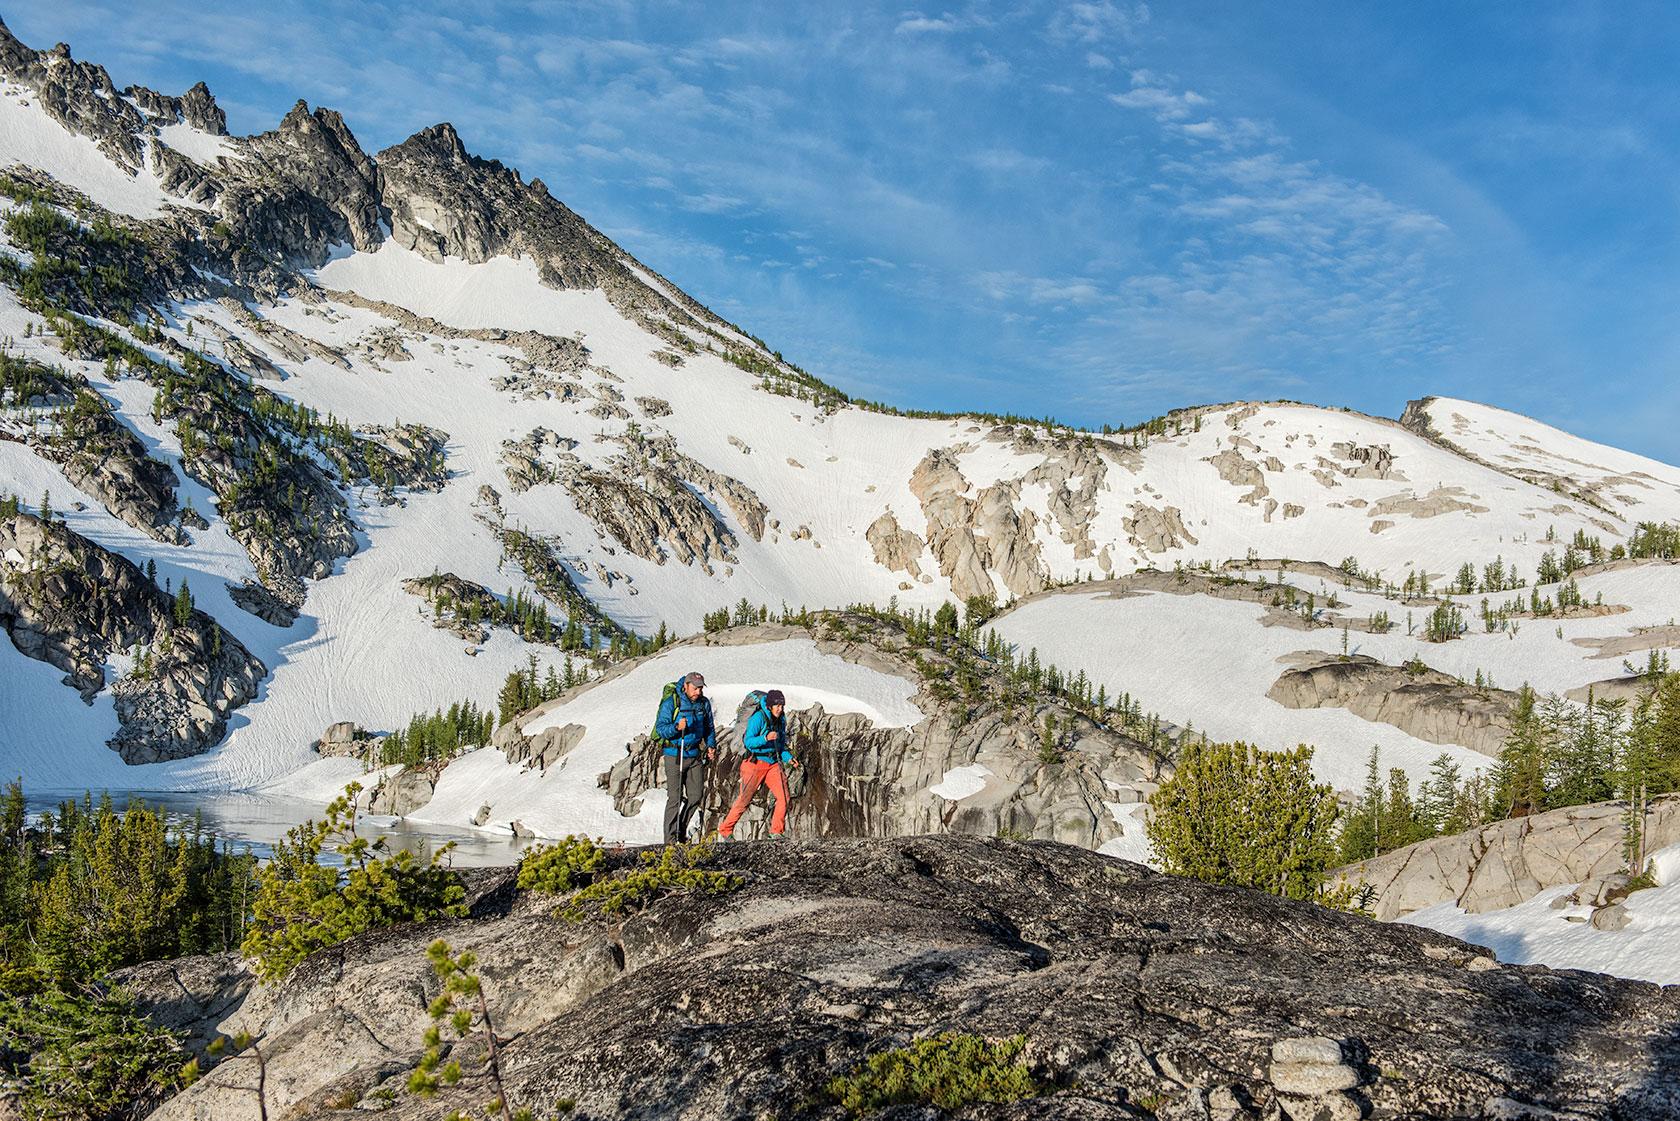 austin-trigg-osprey-hiking-backpacks-hike-camp-washington-adventure-morning-sunrise-lifestyle-outdoor-enchantments-snow-mountains-alpine-wilderness.jpg